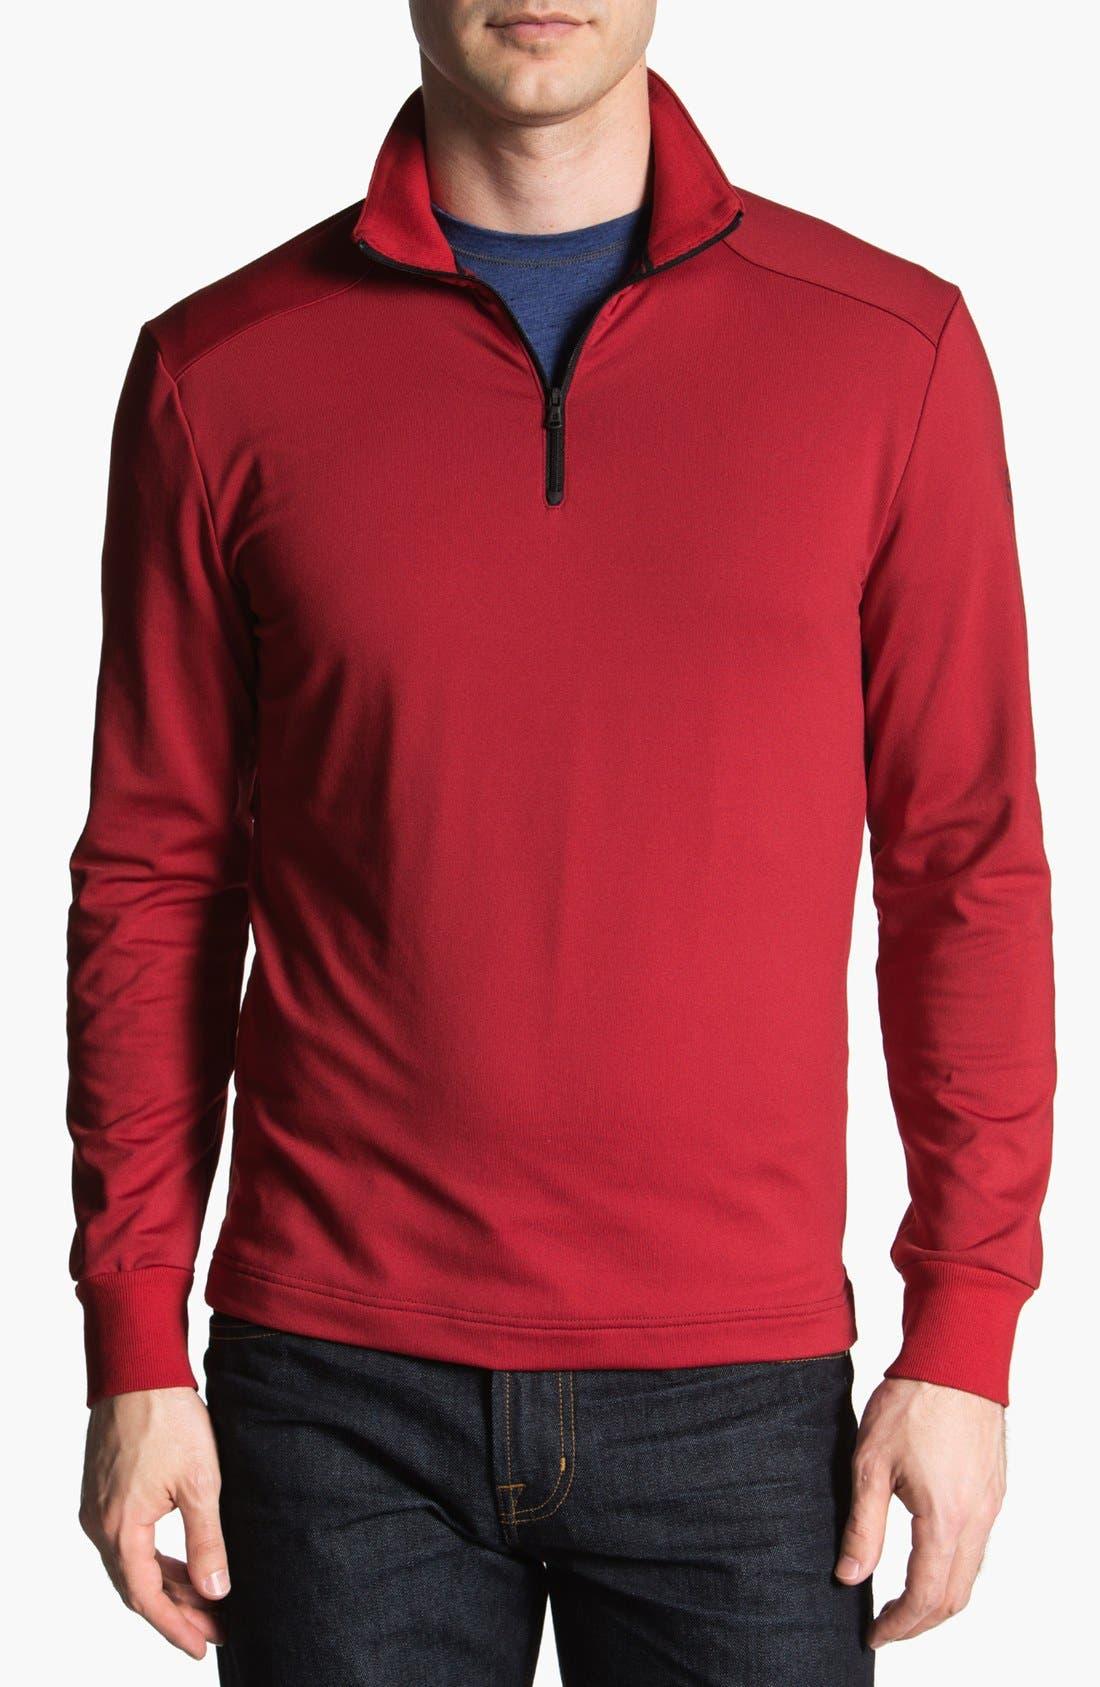 Main Image - Victorinox Swiss Army® 'Langden' Quarter Zip Fleece Pullover